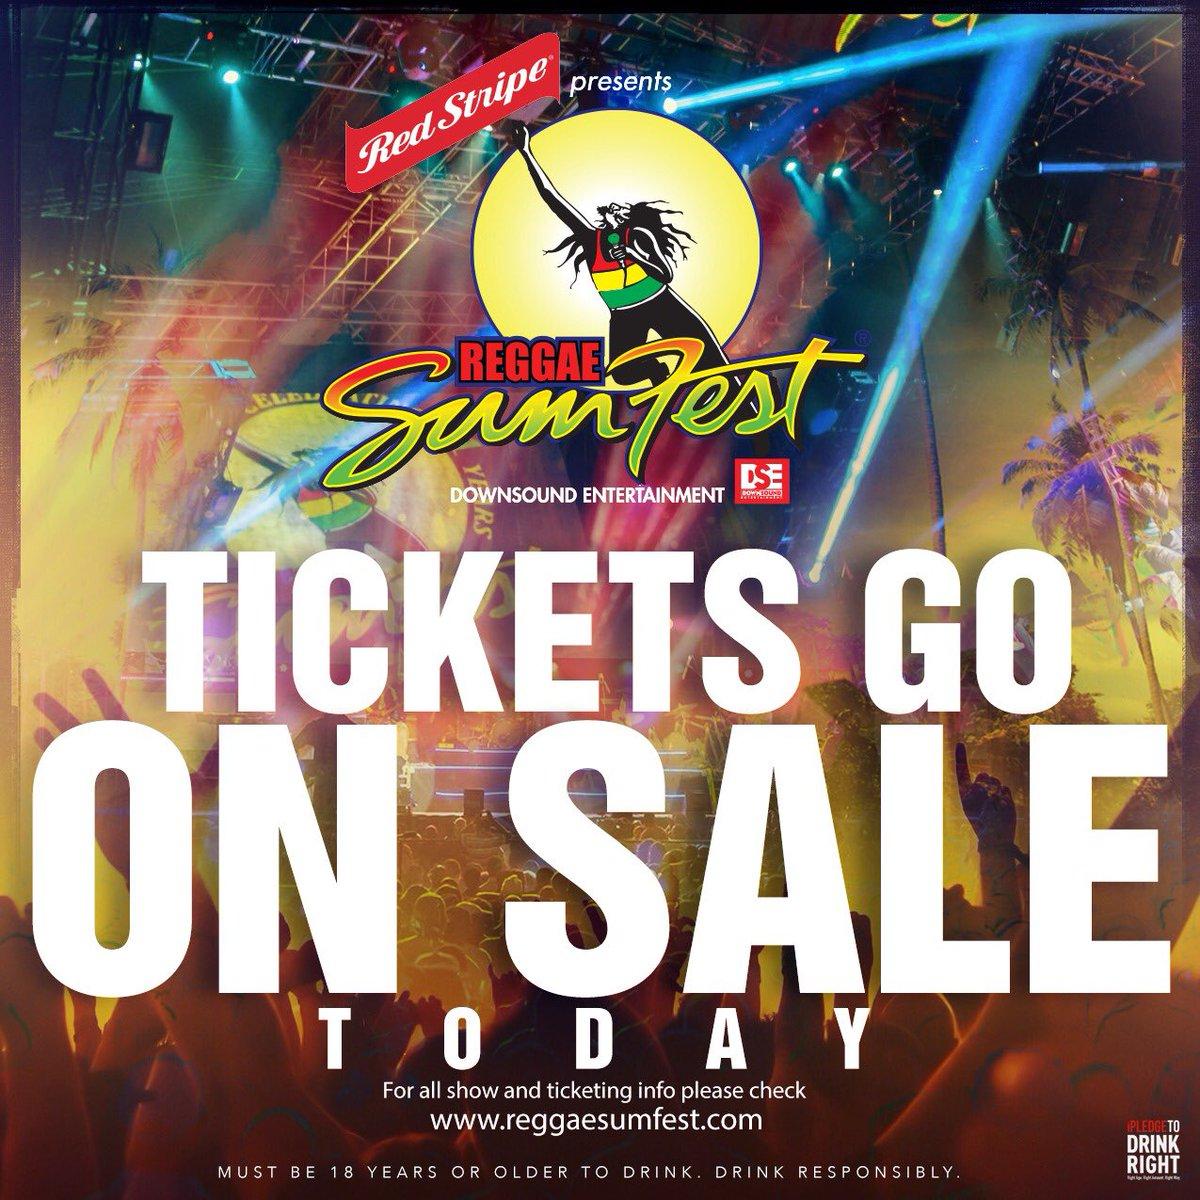 Reggae Sumfest Reggaesumfest Twitter - Reggae sumfest